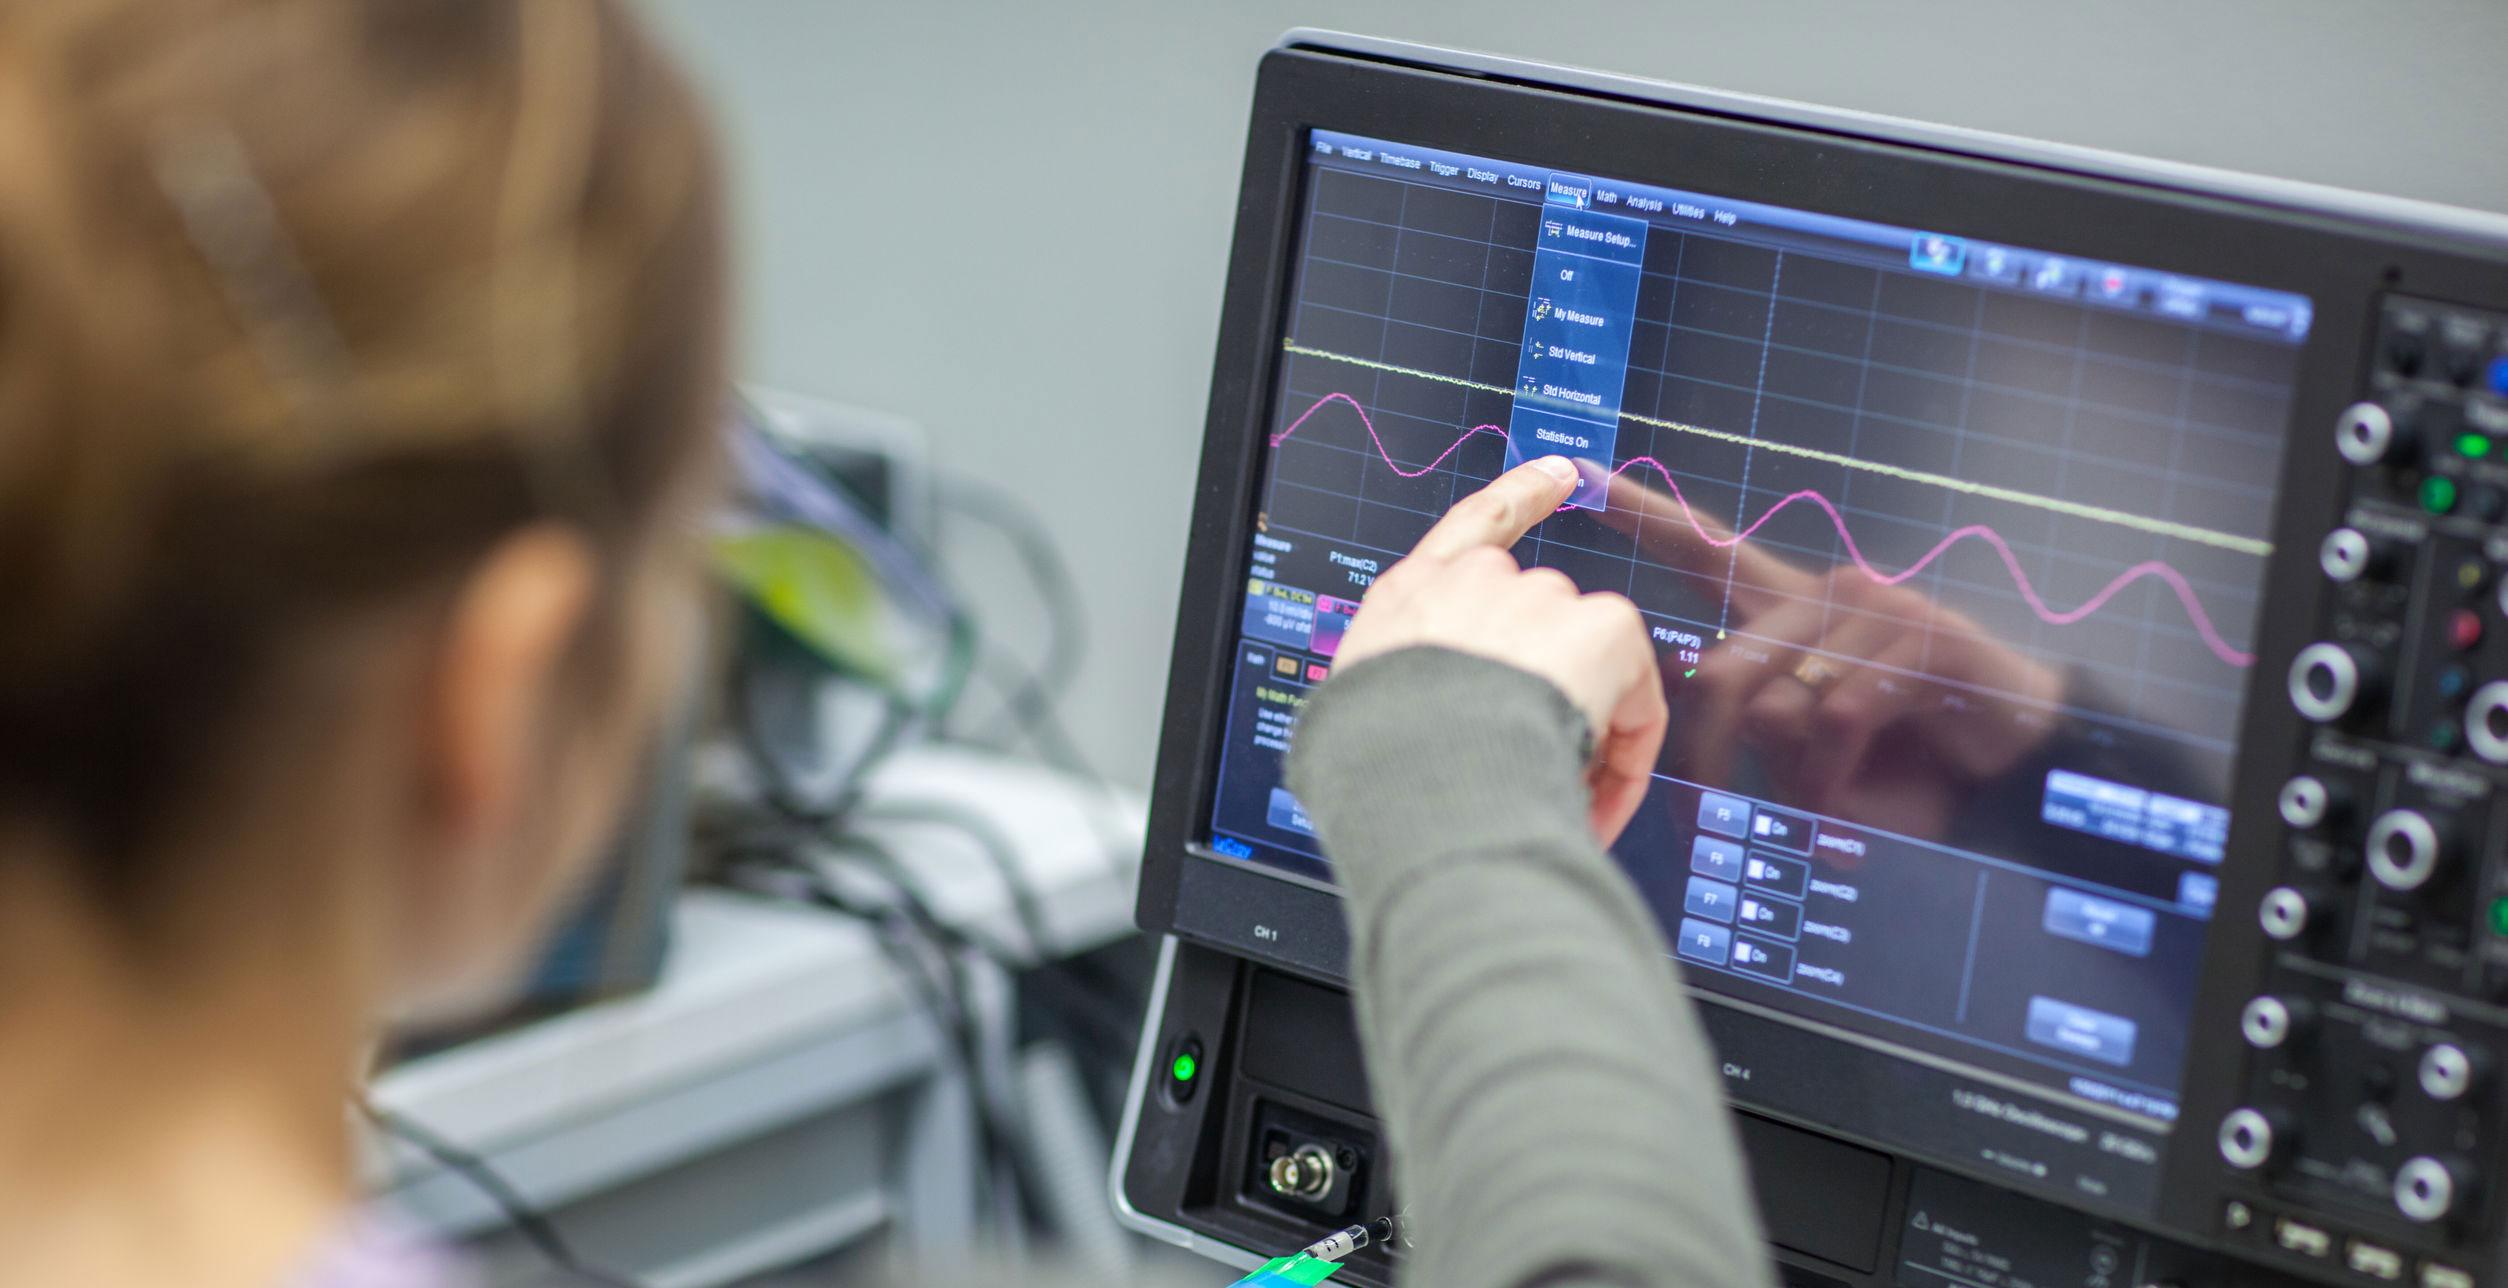 Laser technician in an aerospace lab